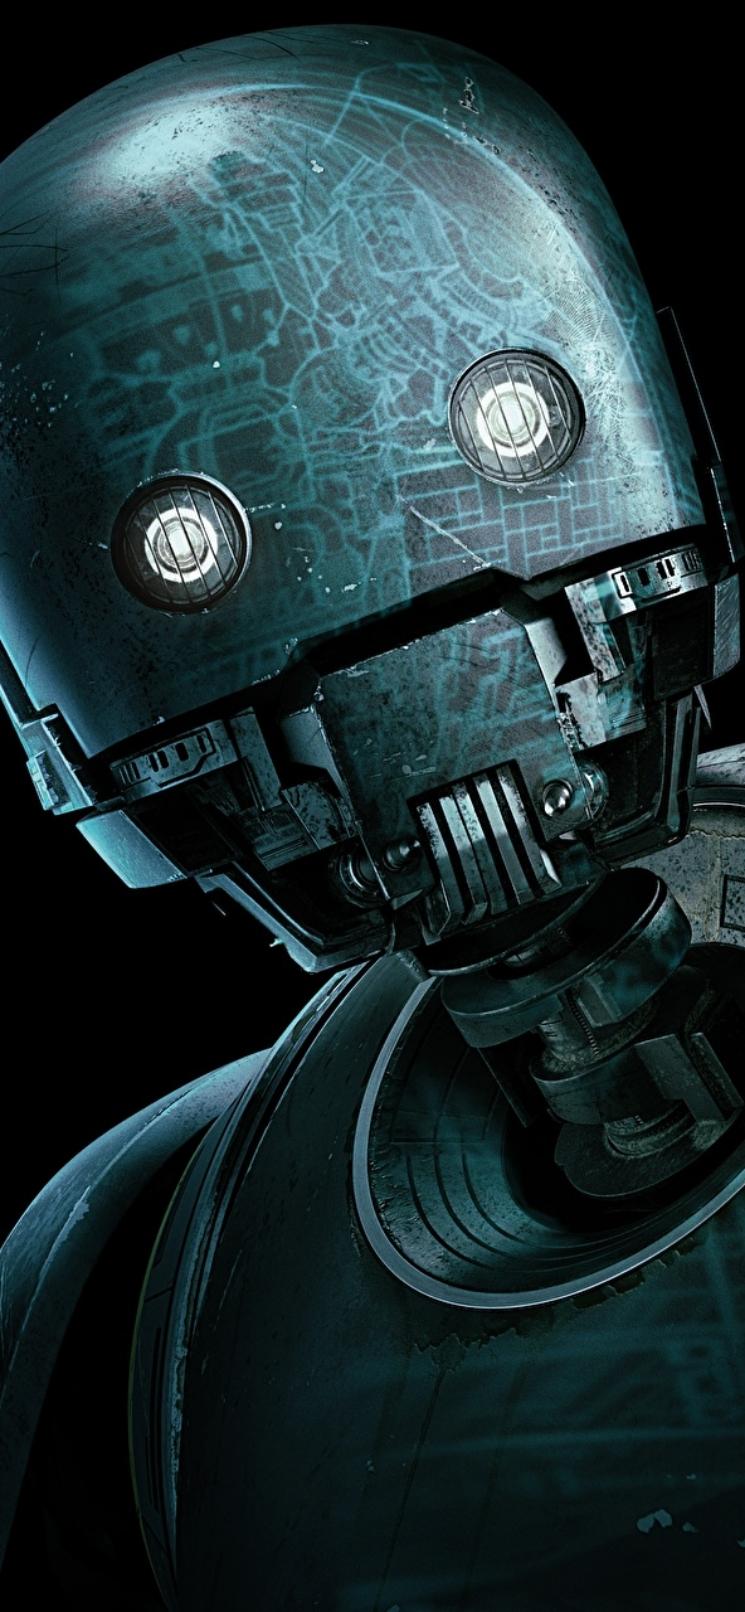 star wars rogue one robot wallpaper iphone